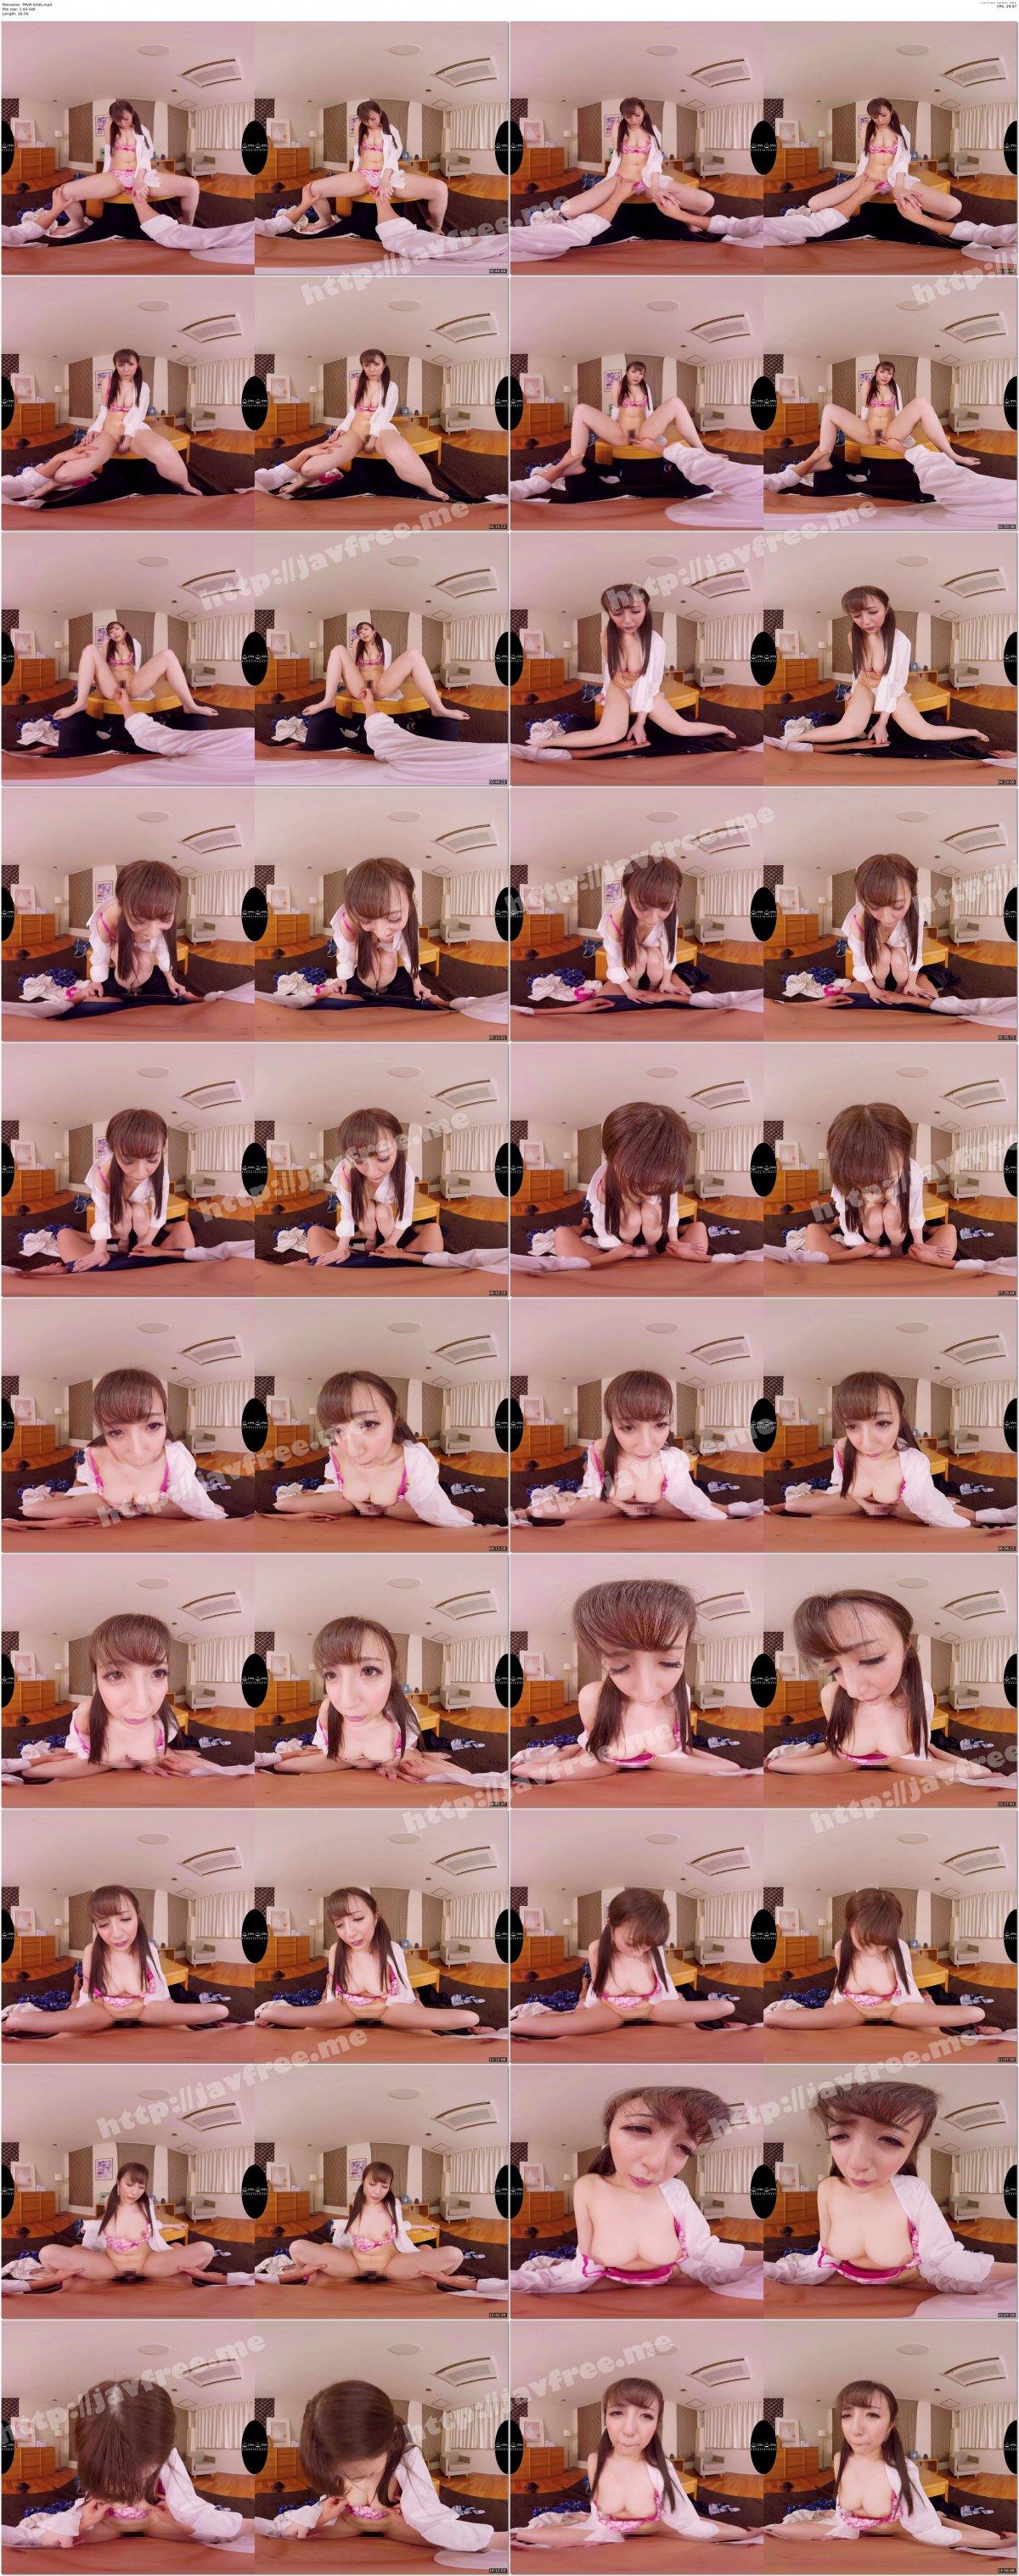 [TPVR-025] 【VR】地味っ娘がメガネを外し覚醒 本当の快感を知る。逢沢まりあ - image TPVR-025b on https://javfree.me